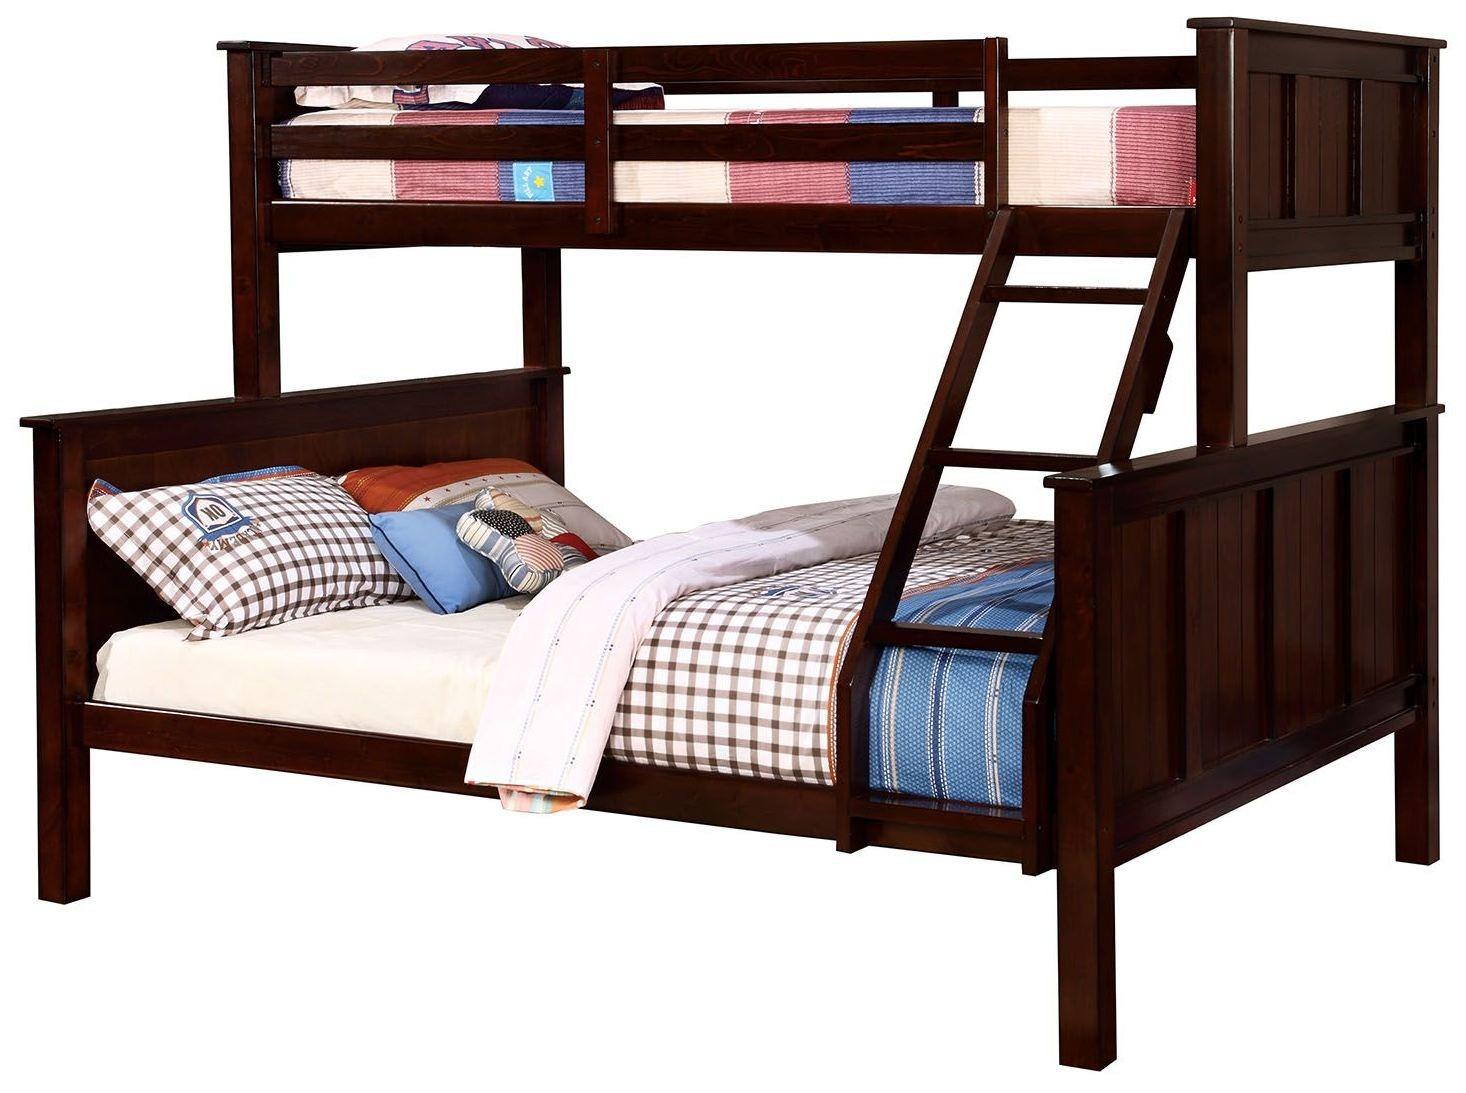 gracie dark walnut twin over queen bunk bed cm bk930tq furniture of america. Black Bedroom Furniture Sets. Home Design Ideas